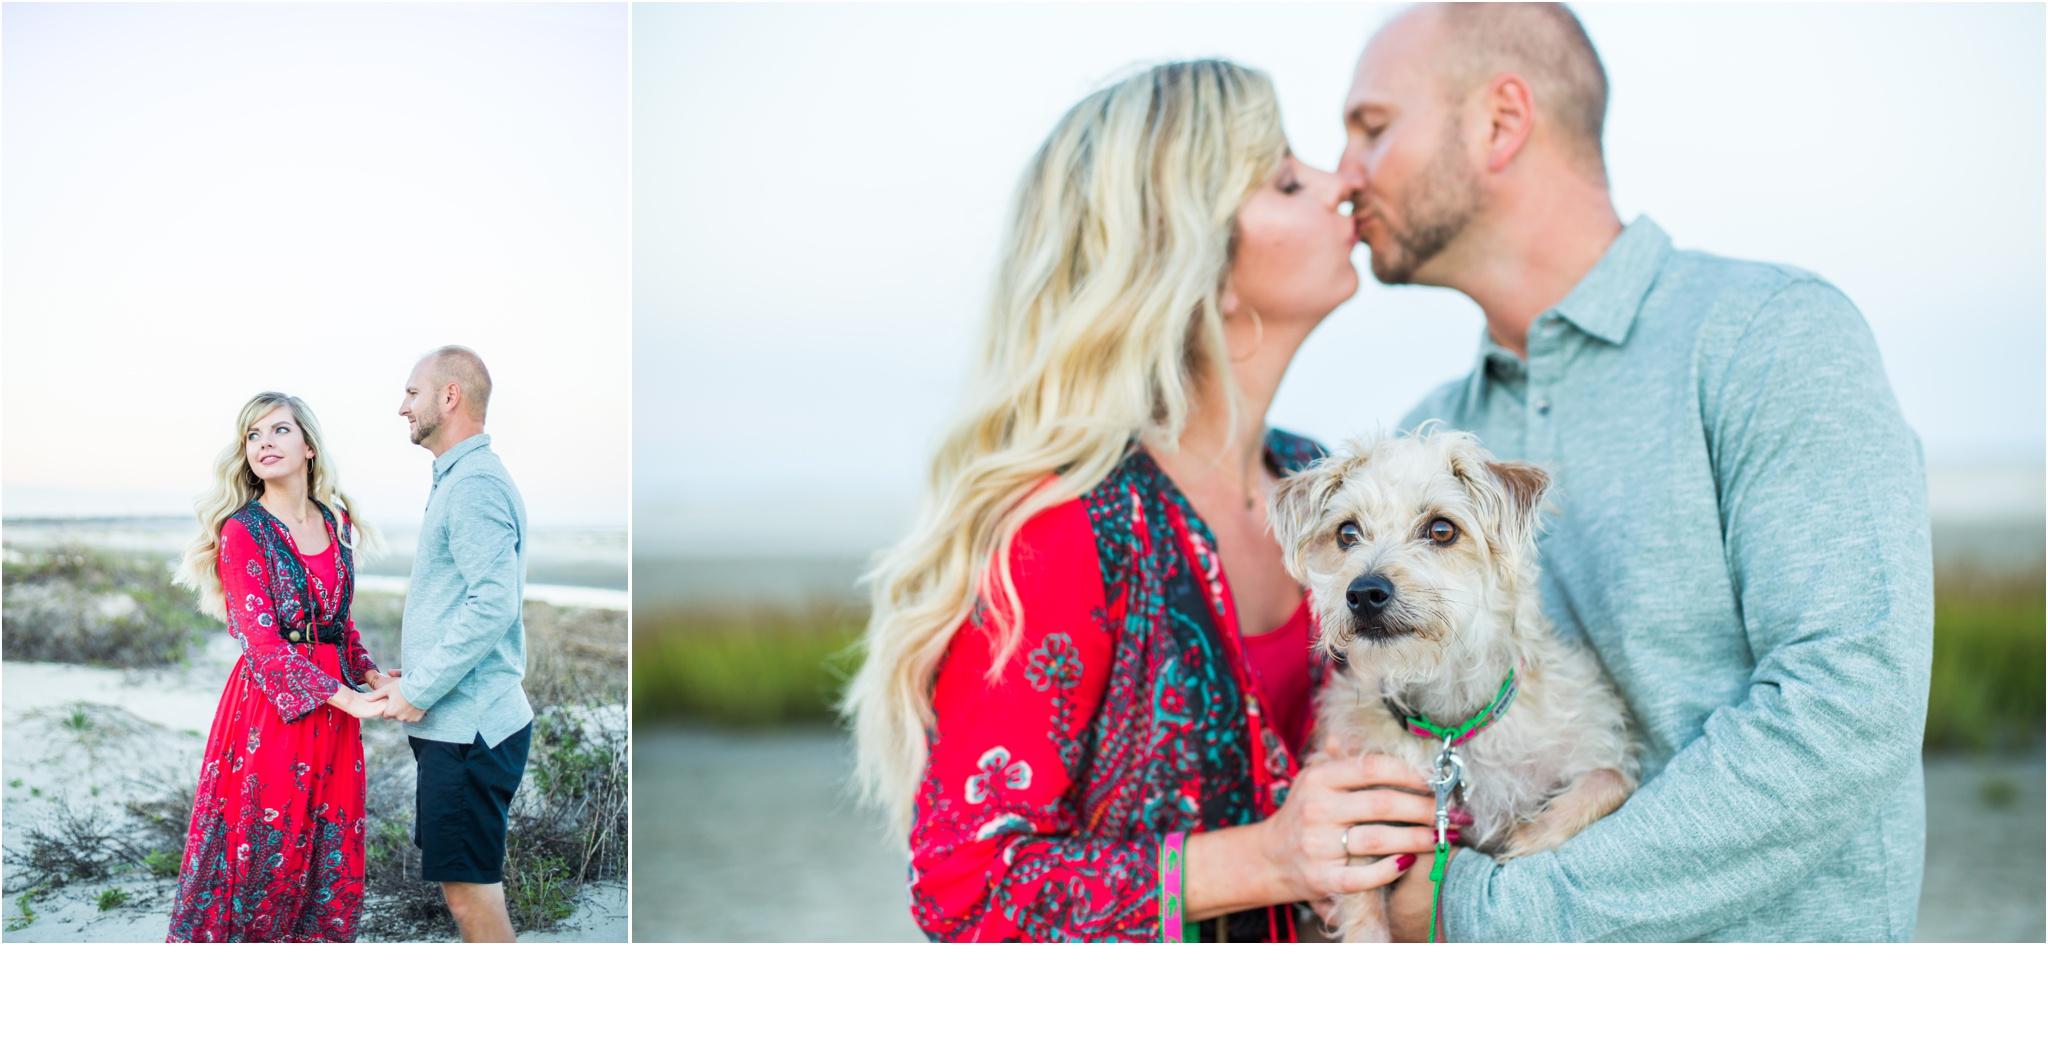 Rainey_Gregg_Photography_St._Simons_Island_Georgia_California_Wedding_Portrait_Photography_0269.jpg